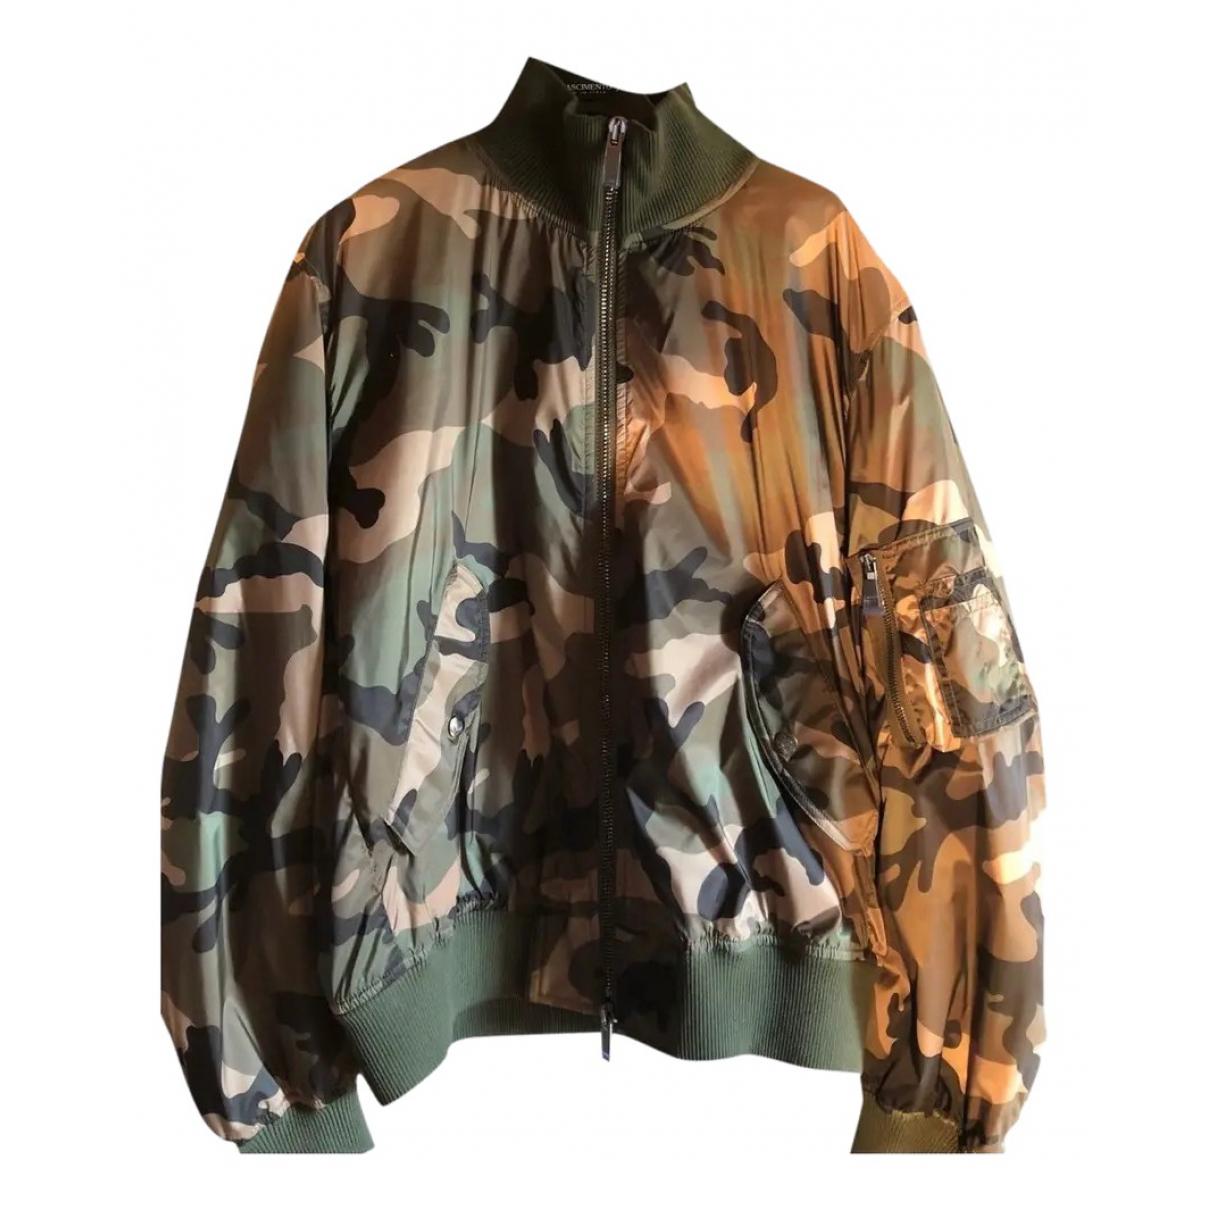 Valentino Garavani \N Khaki jacket  for Men XL International